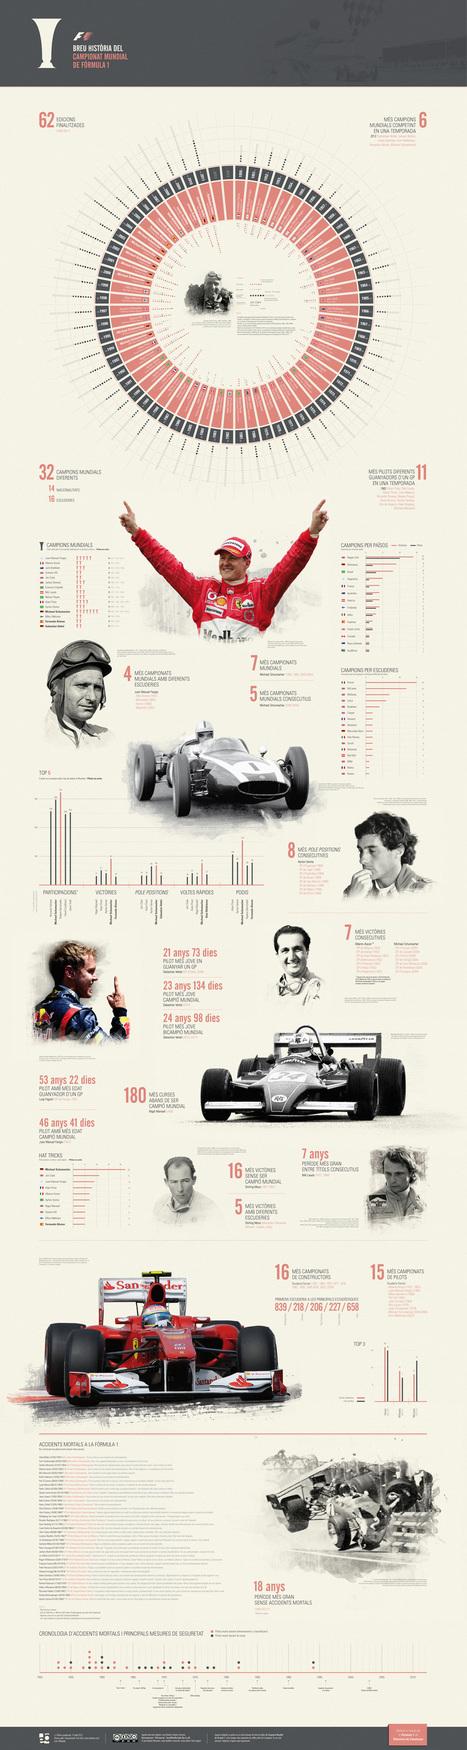 Un poco de Historia #infografía del mundial de la Fórmula 1 | Fórmula 1 | Scoop.it